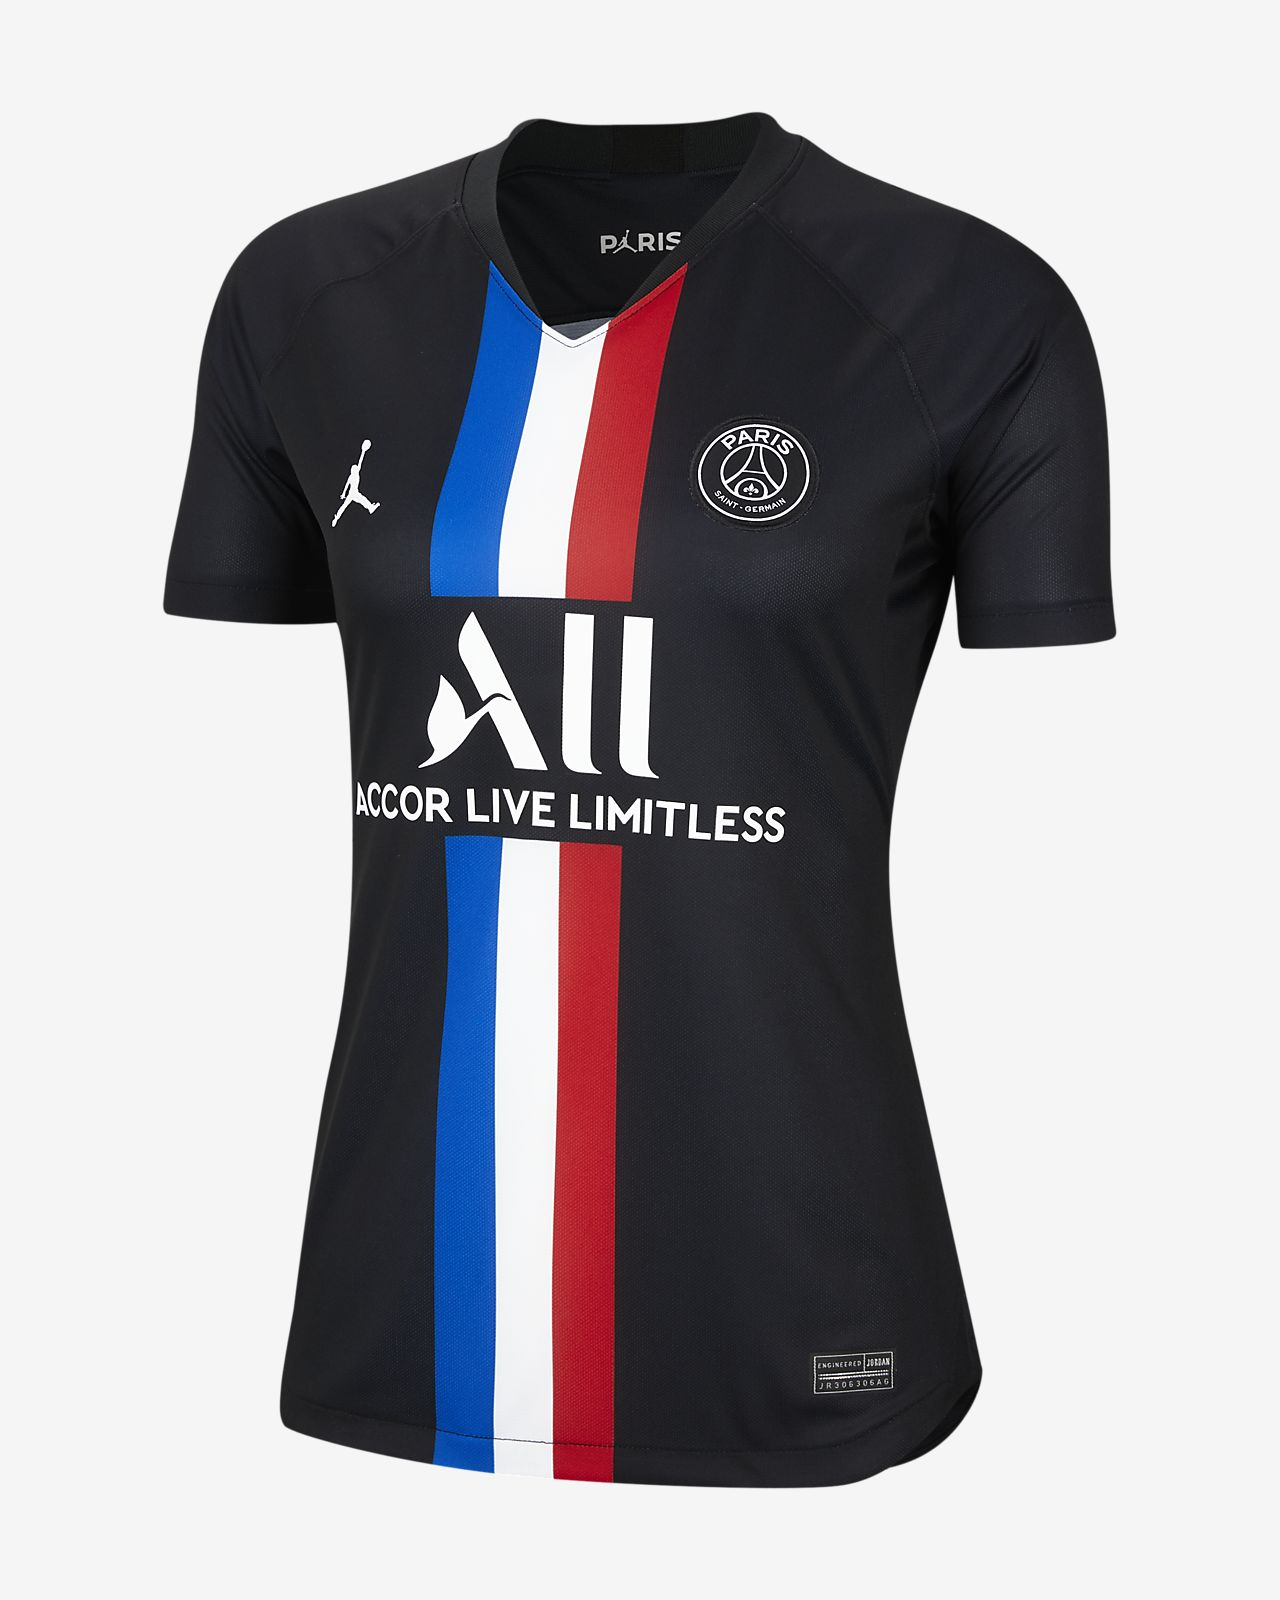 Jordan x Paris Saint-Germain 2019/20 Stadium Fourth Women's Football Shirt